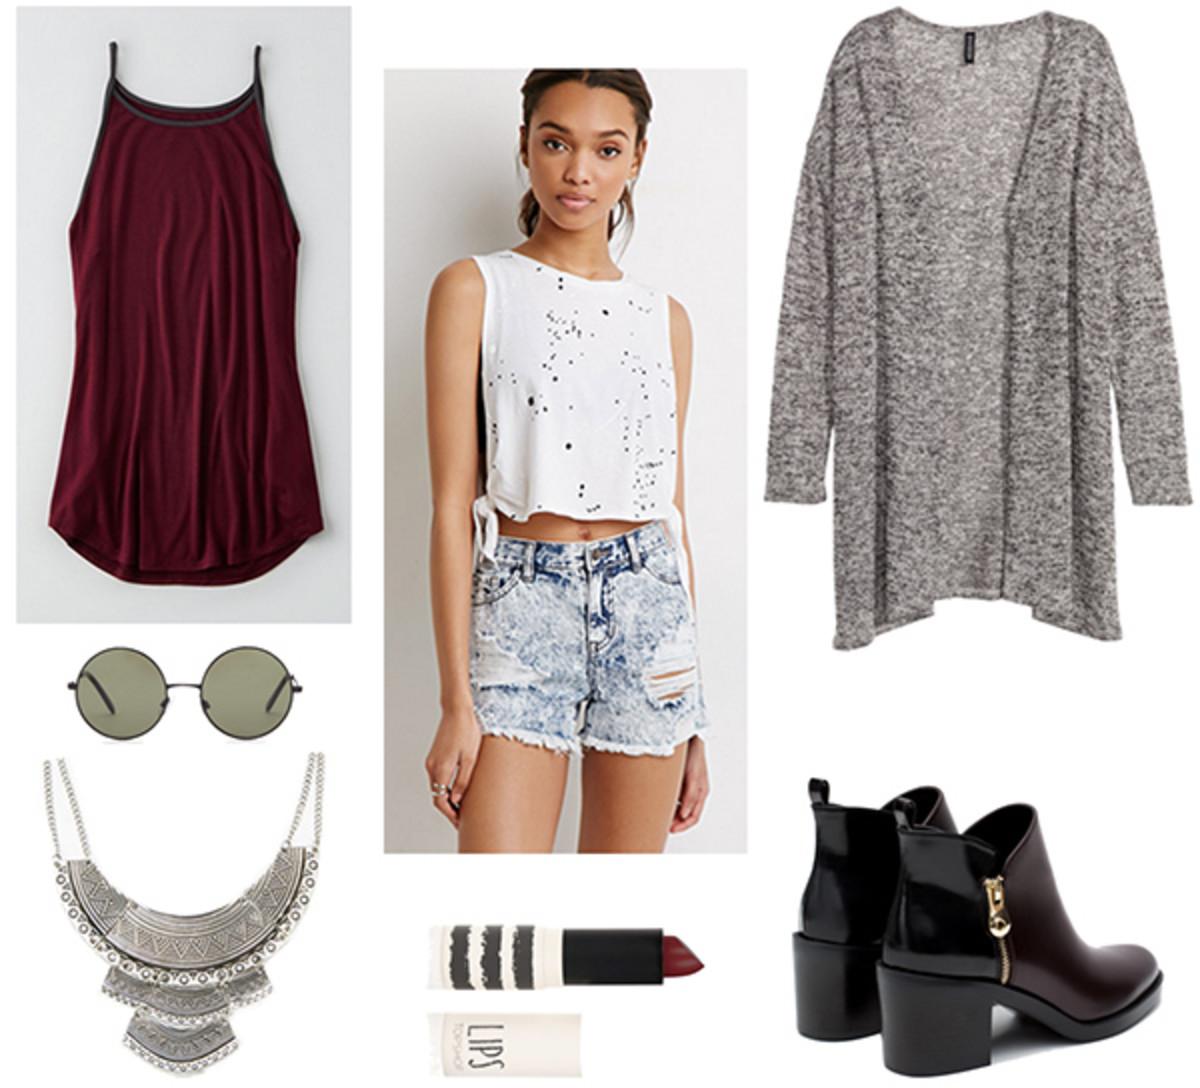 blue-light-shorts-r-burgundy-top-tank-grayl-cardiganl-bib-necklace-black-shoe-booties-sun-howtowear-fashion-style-outfit-fall-winter-weekend.jpg